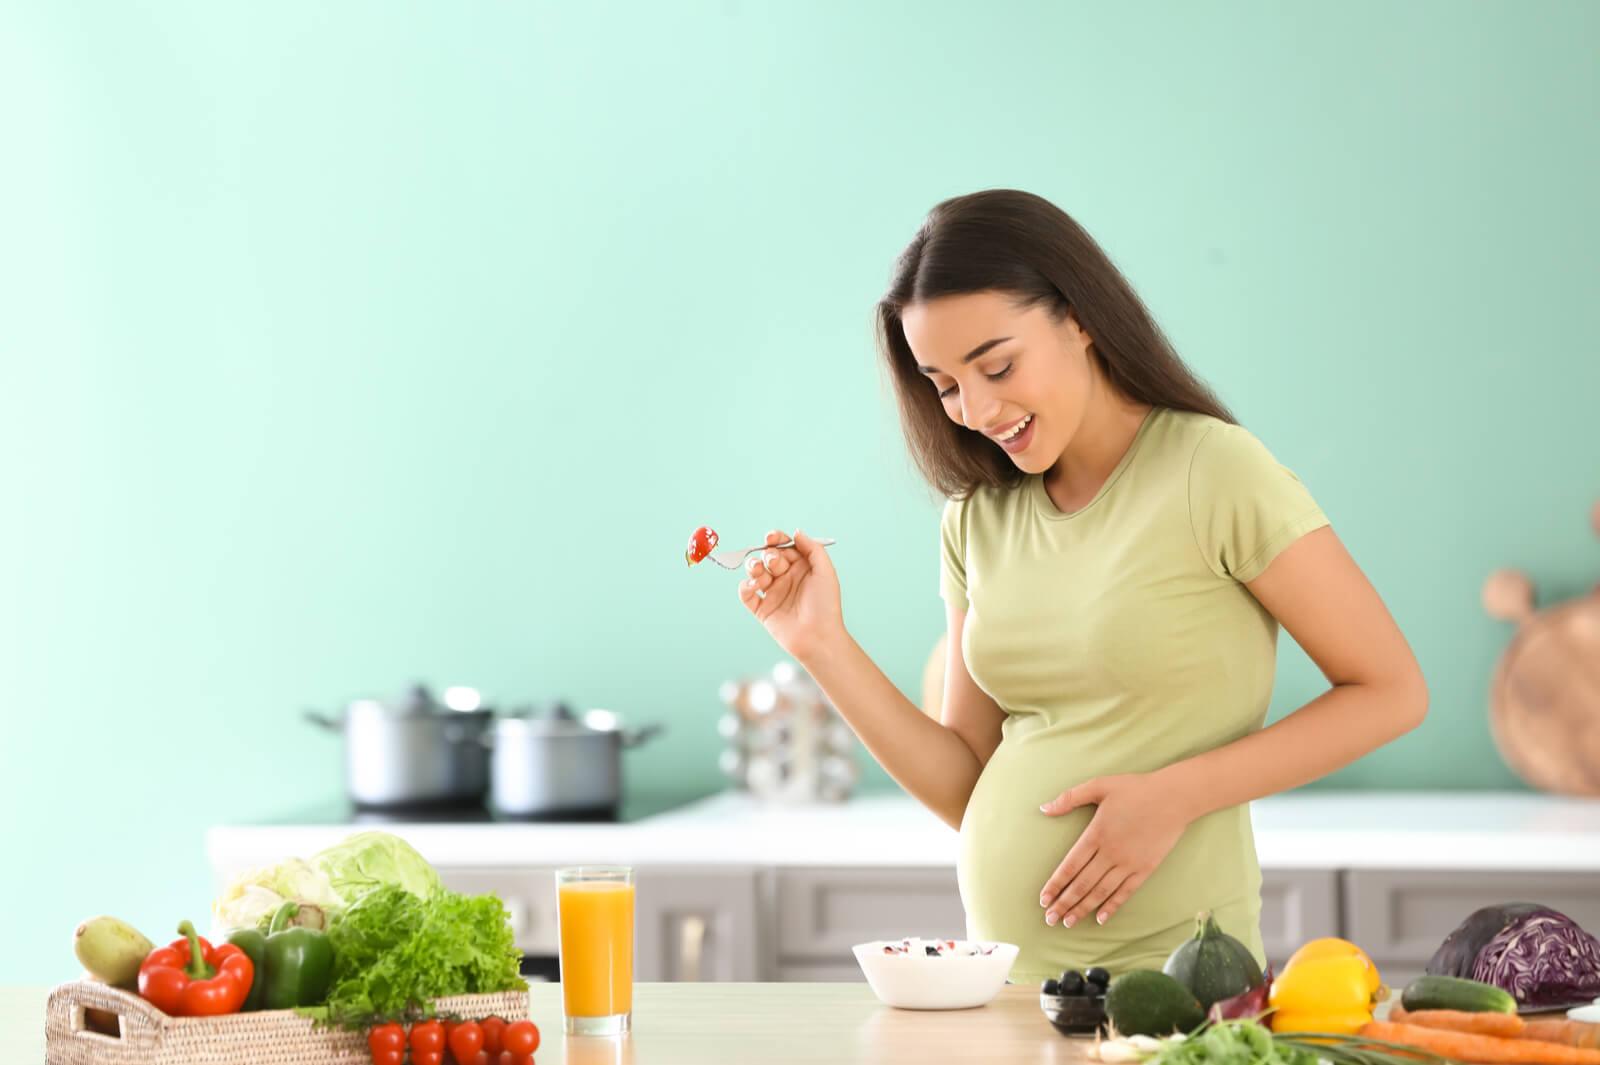 Makanan Sehat yang Wajib Diberikan untuk Ibu Hamil